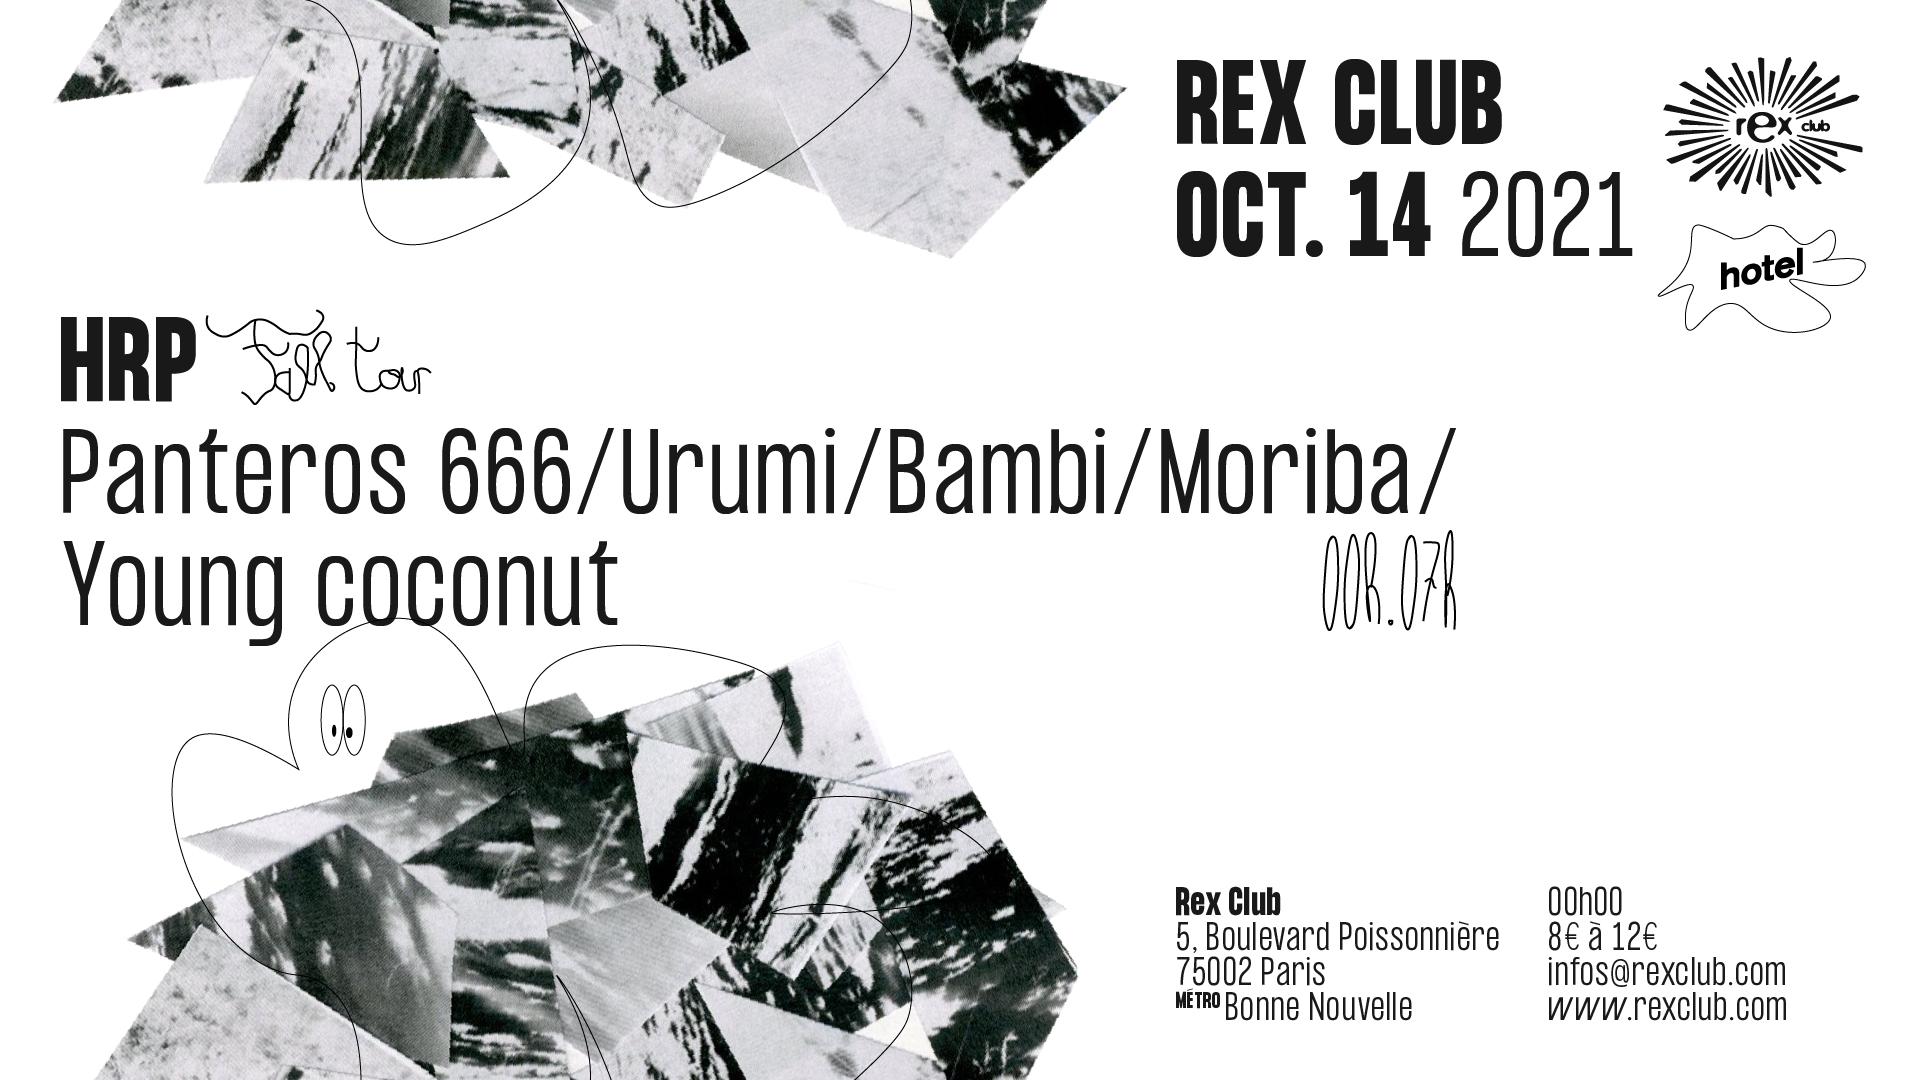 Hotel Radio Paris Fall Tour: Panteros 666, Urumi, Bambi & more